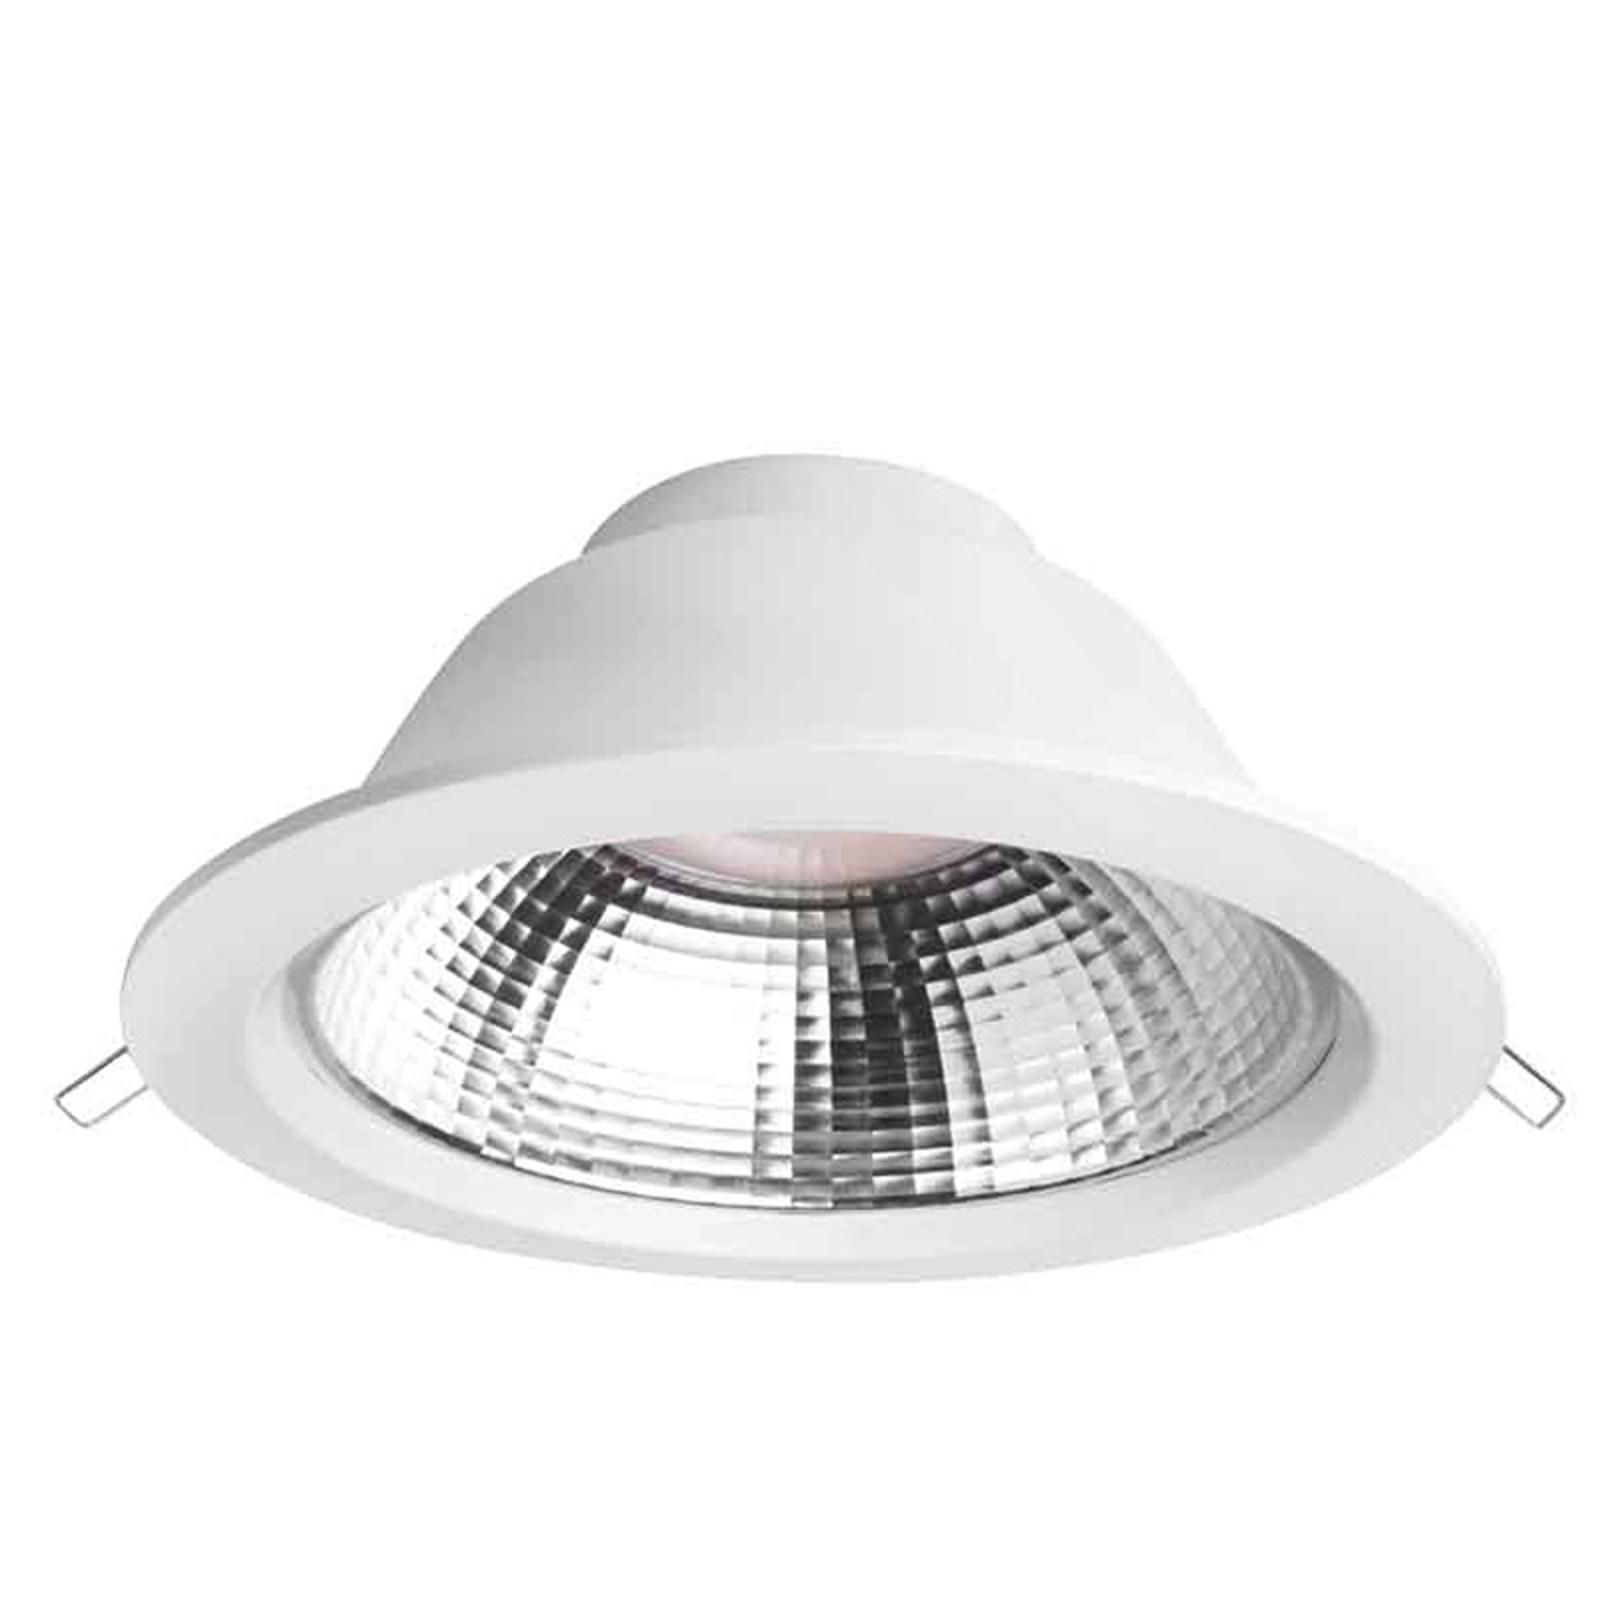 Leuchtstarkes LED-Downlight Siena 19 W